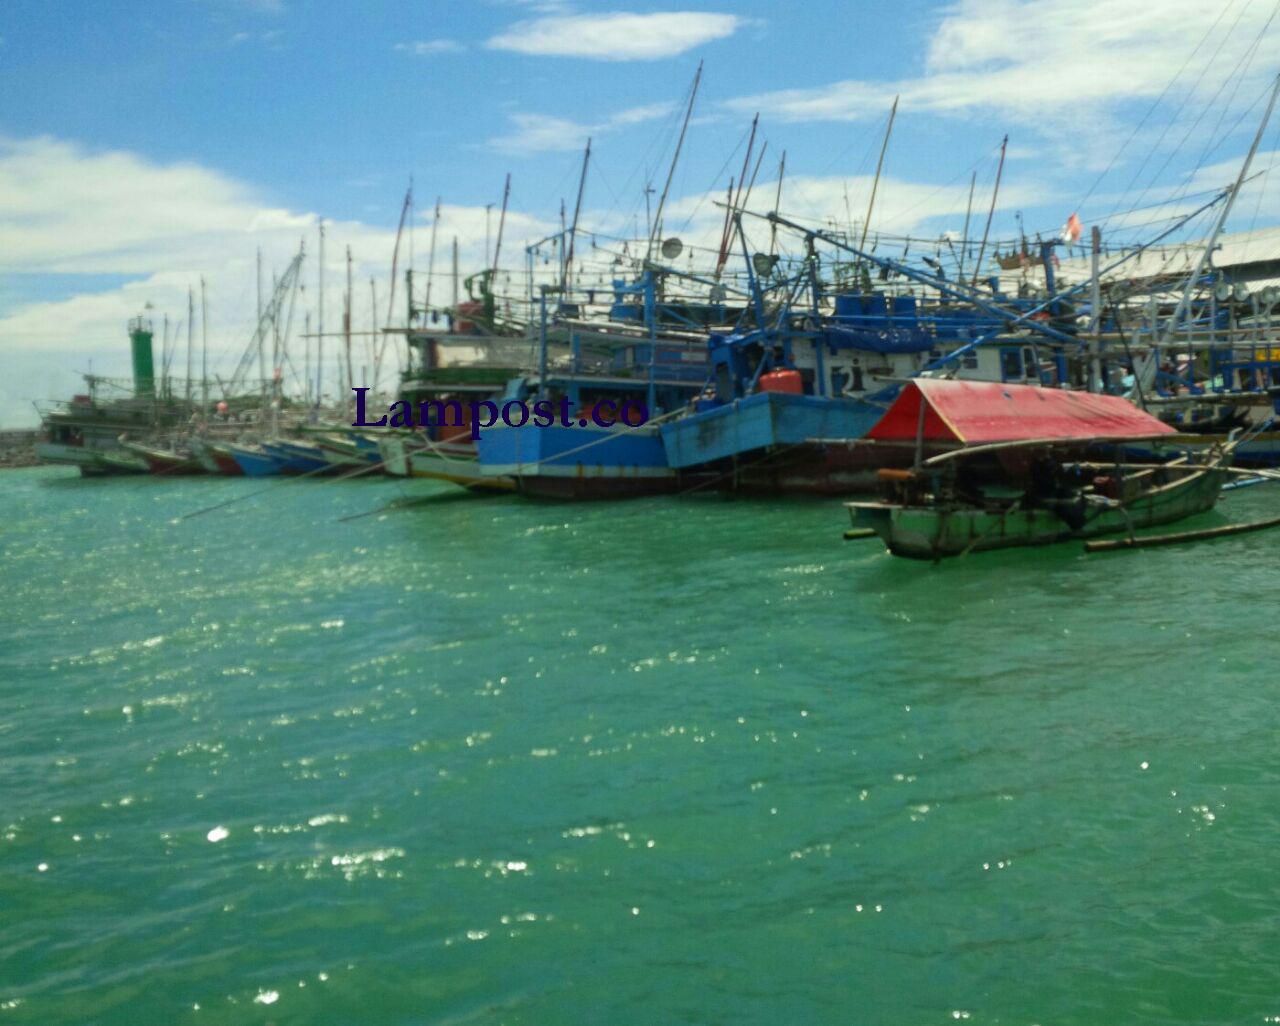 LAMPUNG POST | Cuaca Kembali Ekstrem, Nelayan di Lamsel Tak Melaut